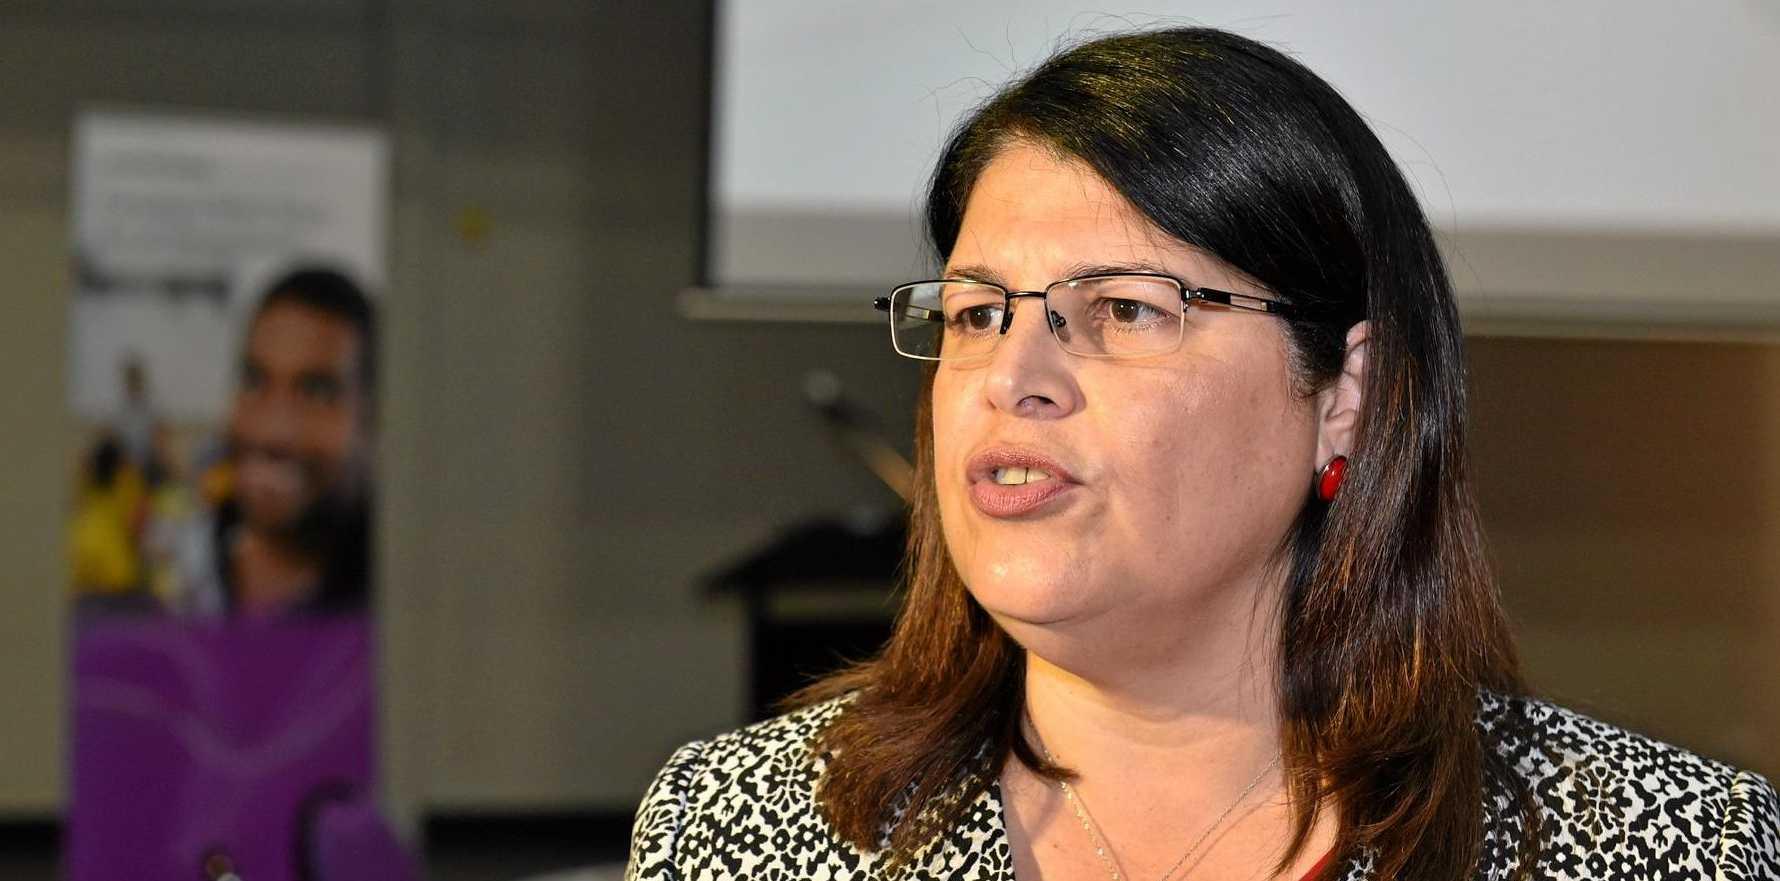 Employment Minister Grace Grace applauds Warwick businessman's challenge.